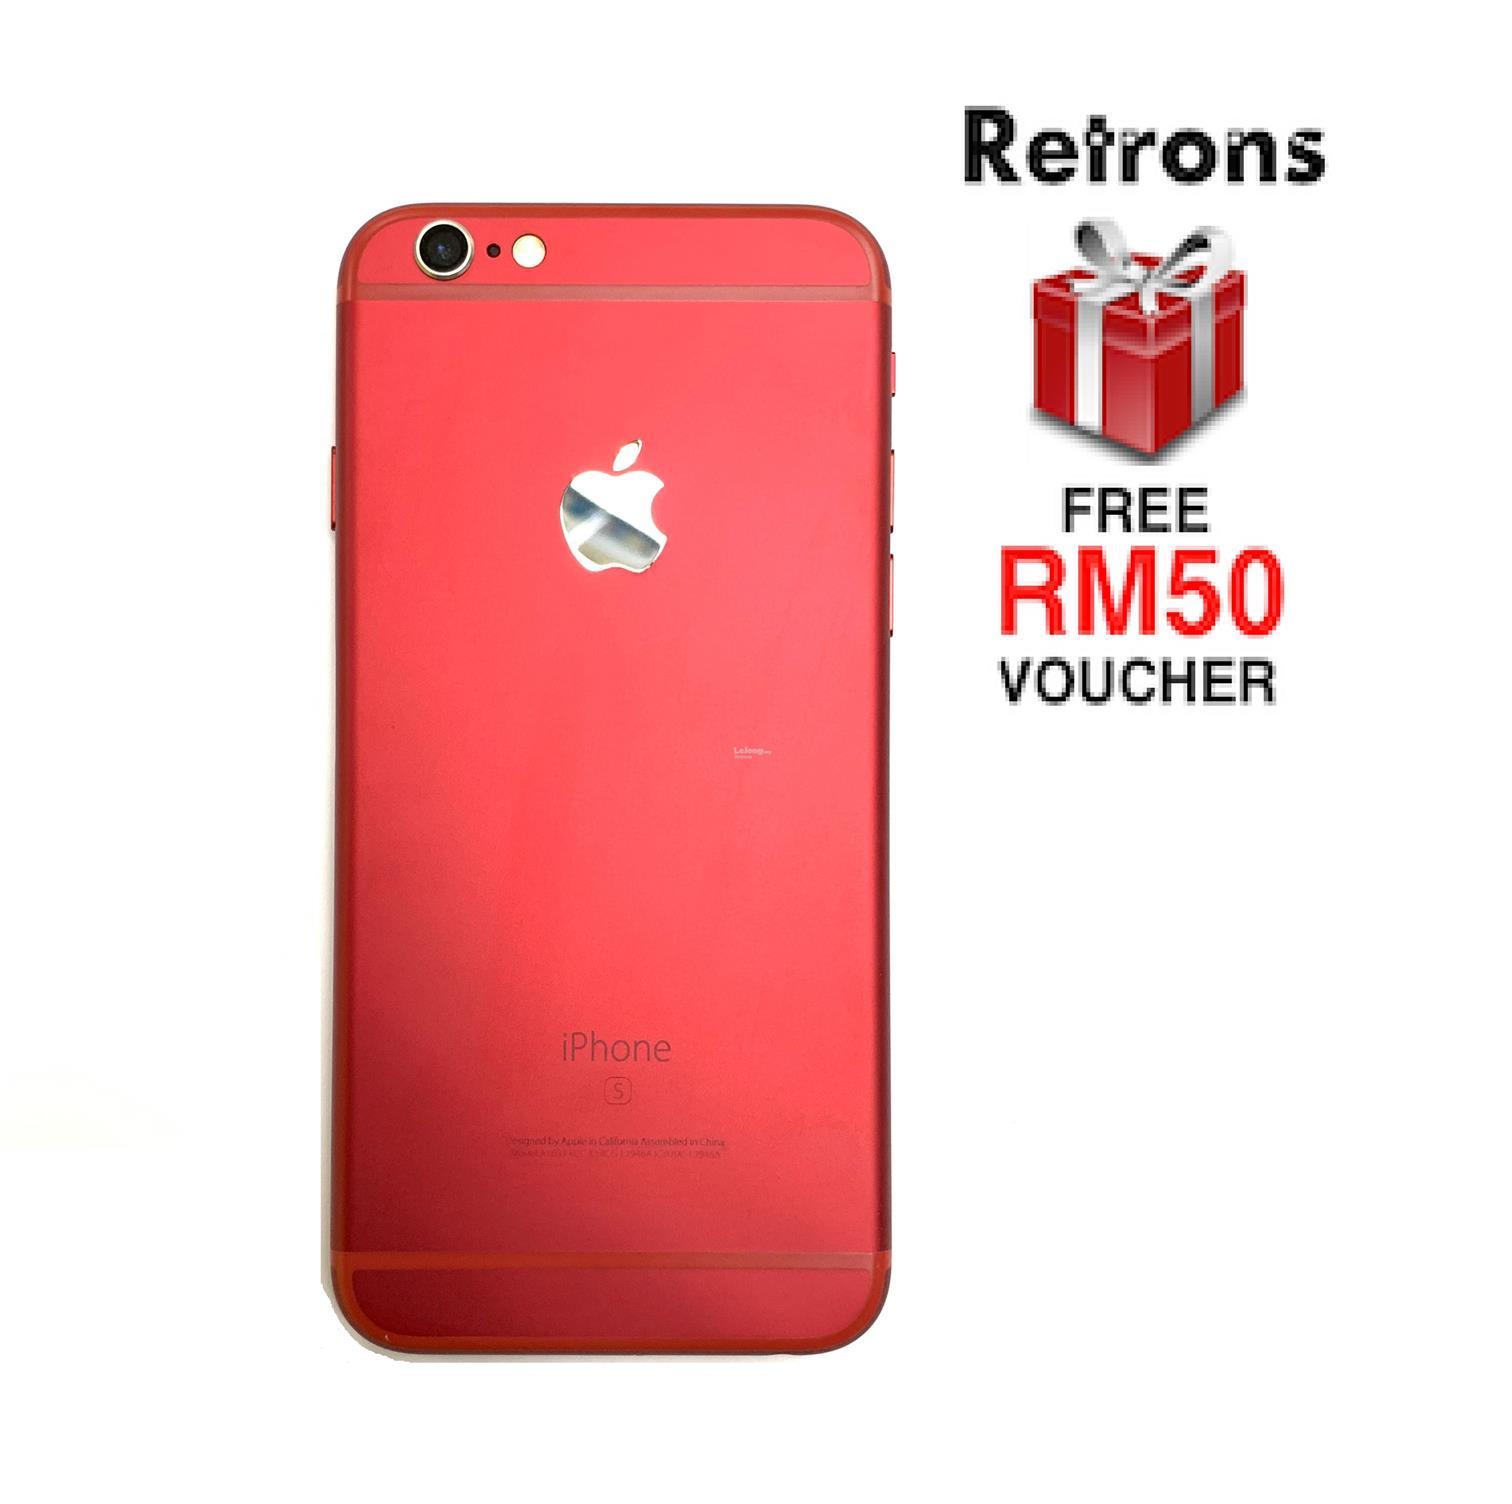 ++ RETRONS ++ APPLE iPHONE 6S PLUS R (end 1 28 2020 4 15 PM) db52cfb2c0